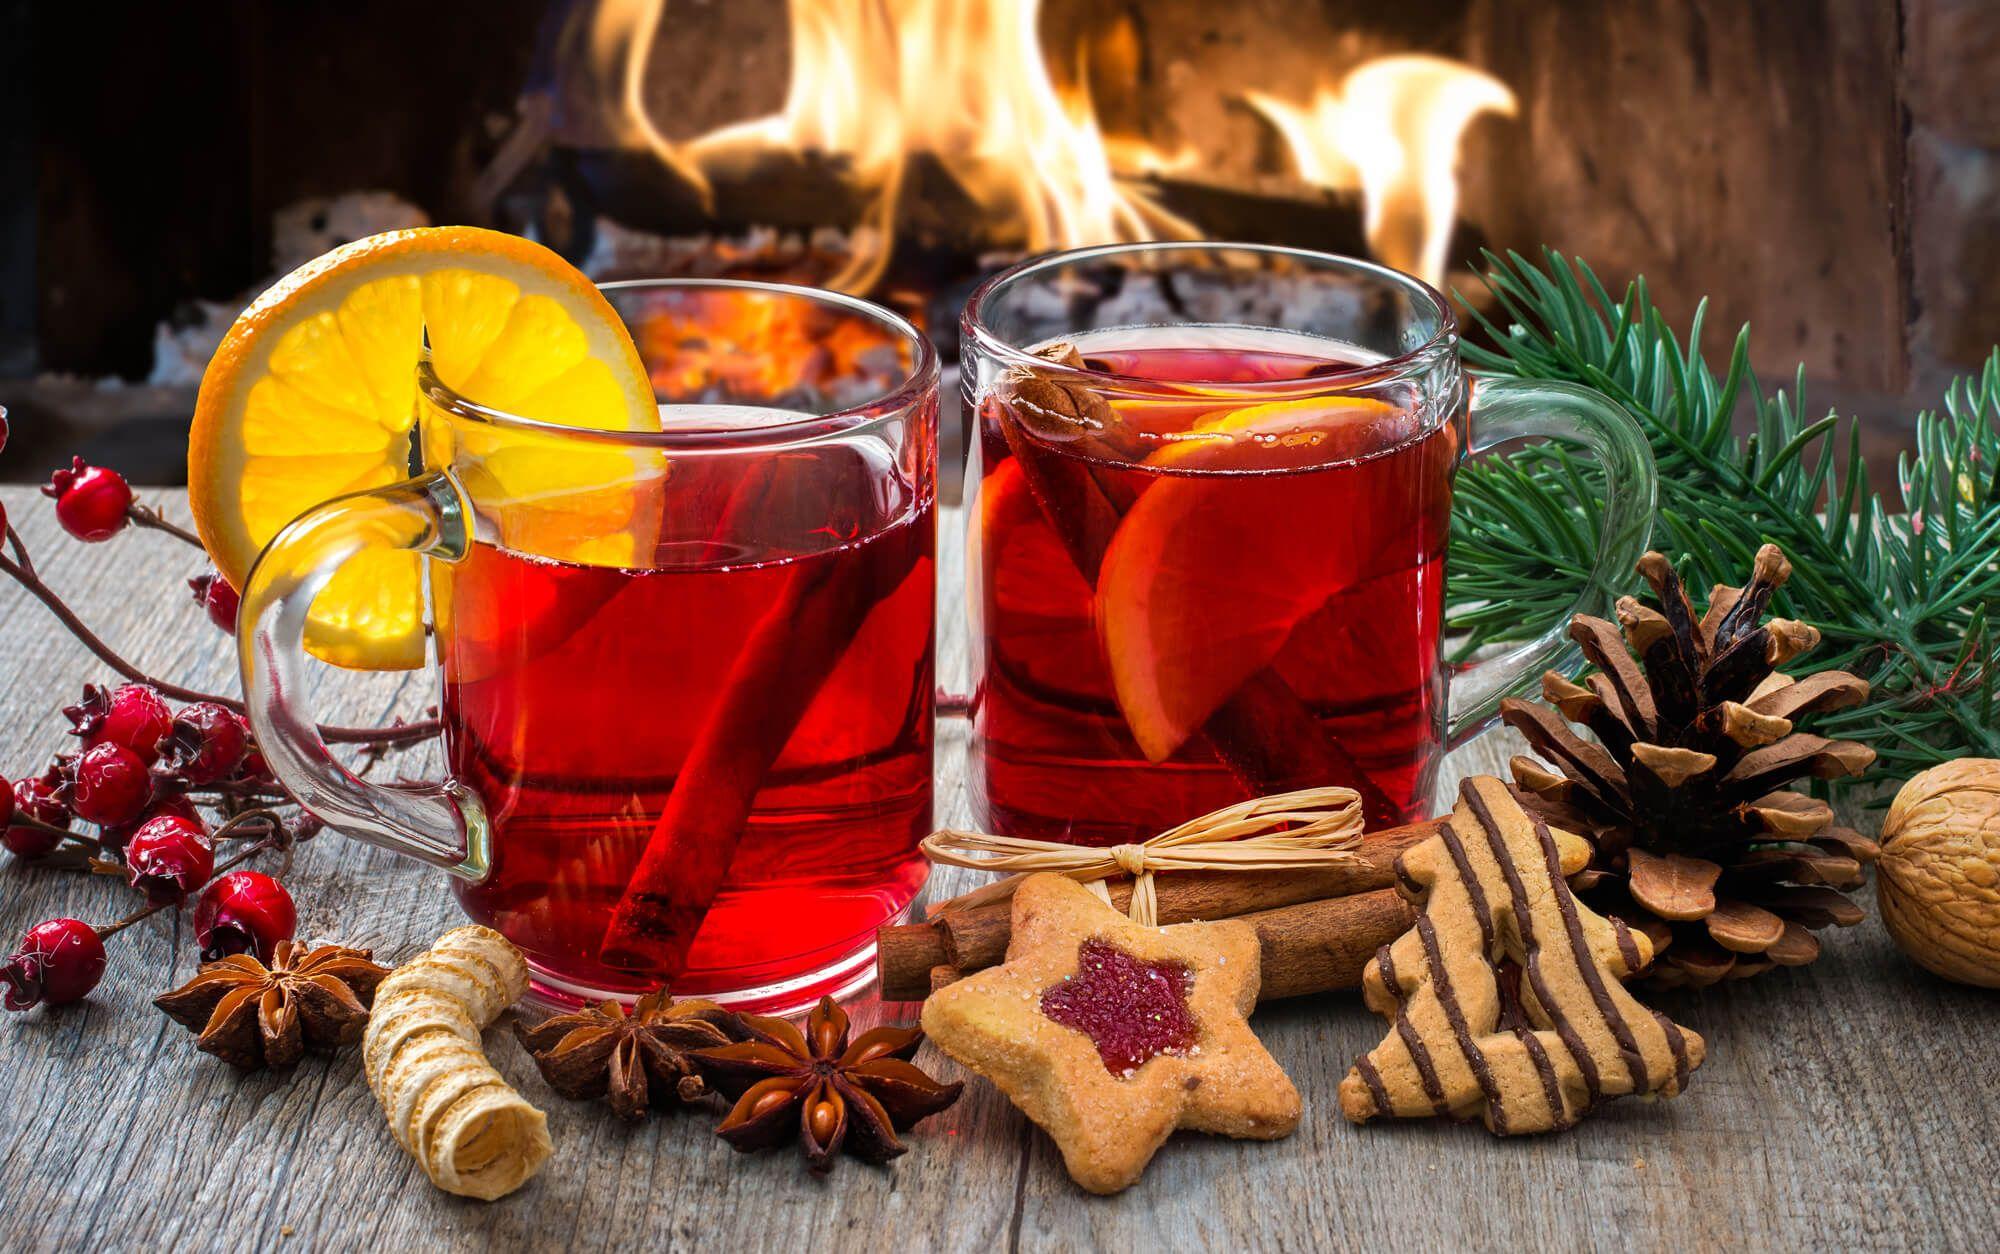 Kinderpunsch German Non Alcoholic Christmas Punch Recipe Christmas Drinks Punch Recipes Non Alcoholic Christmas Punch